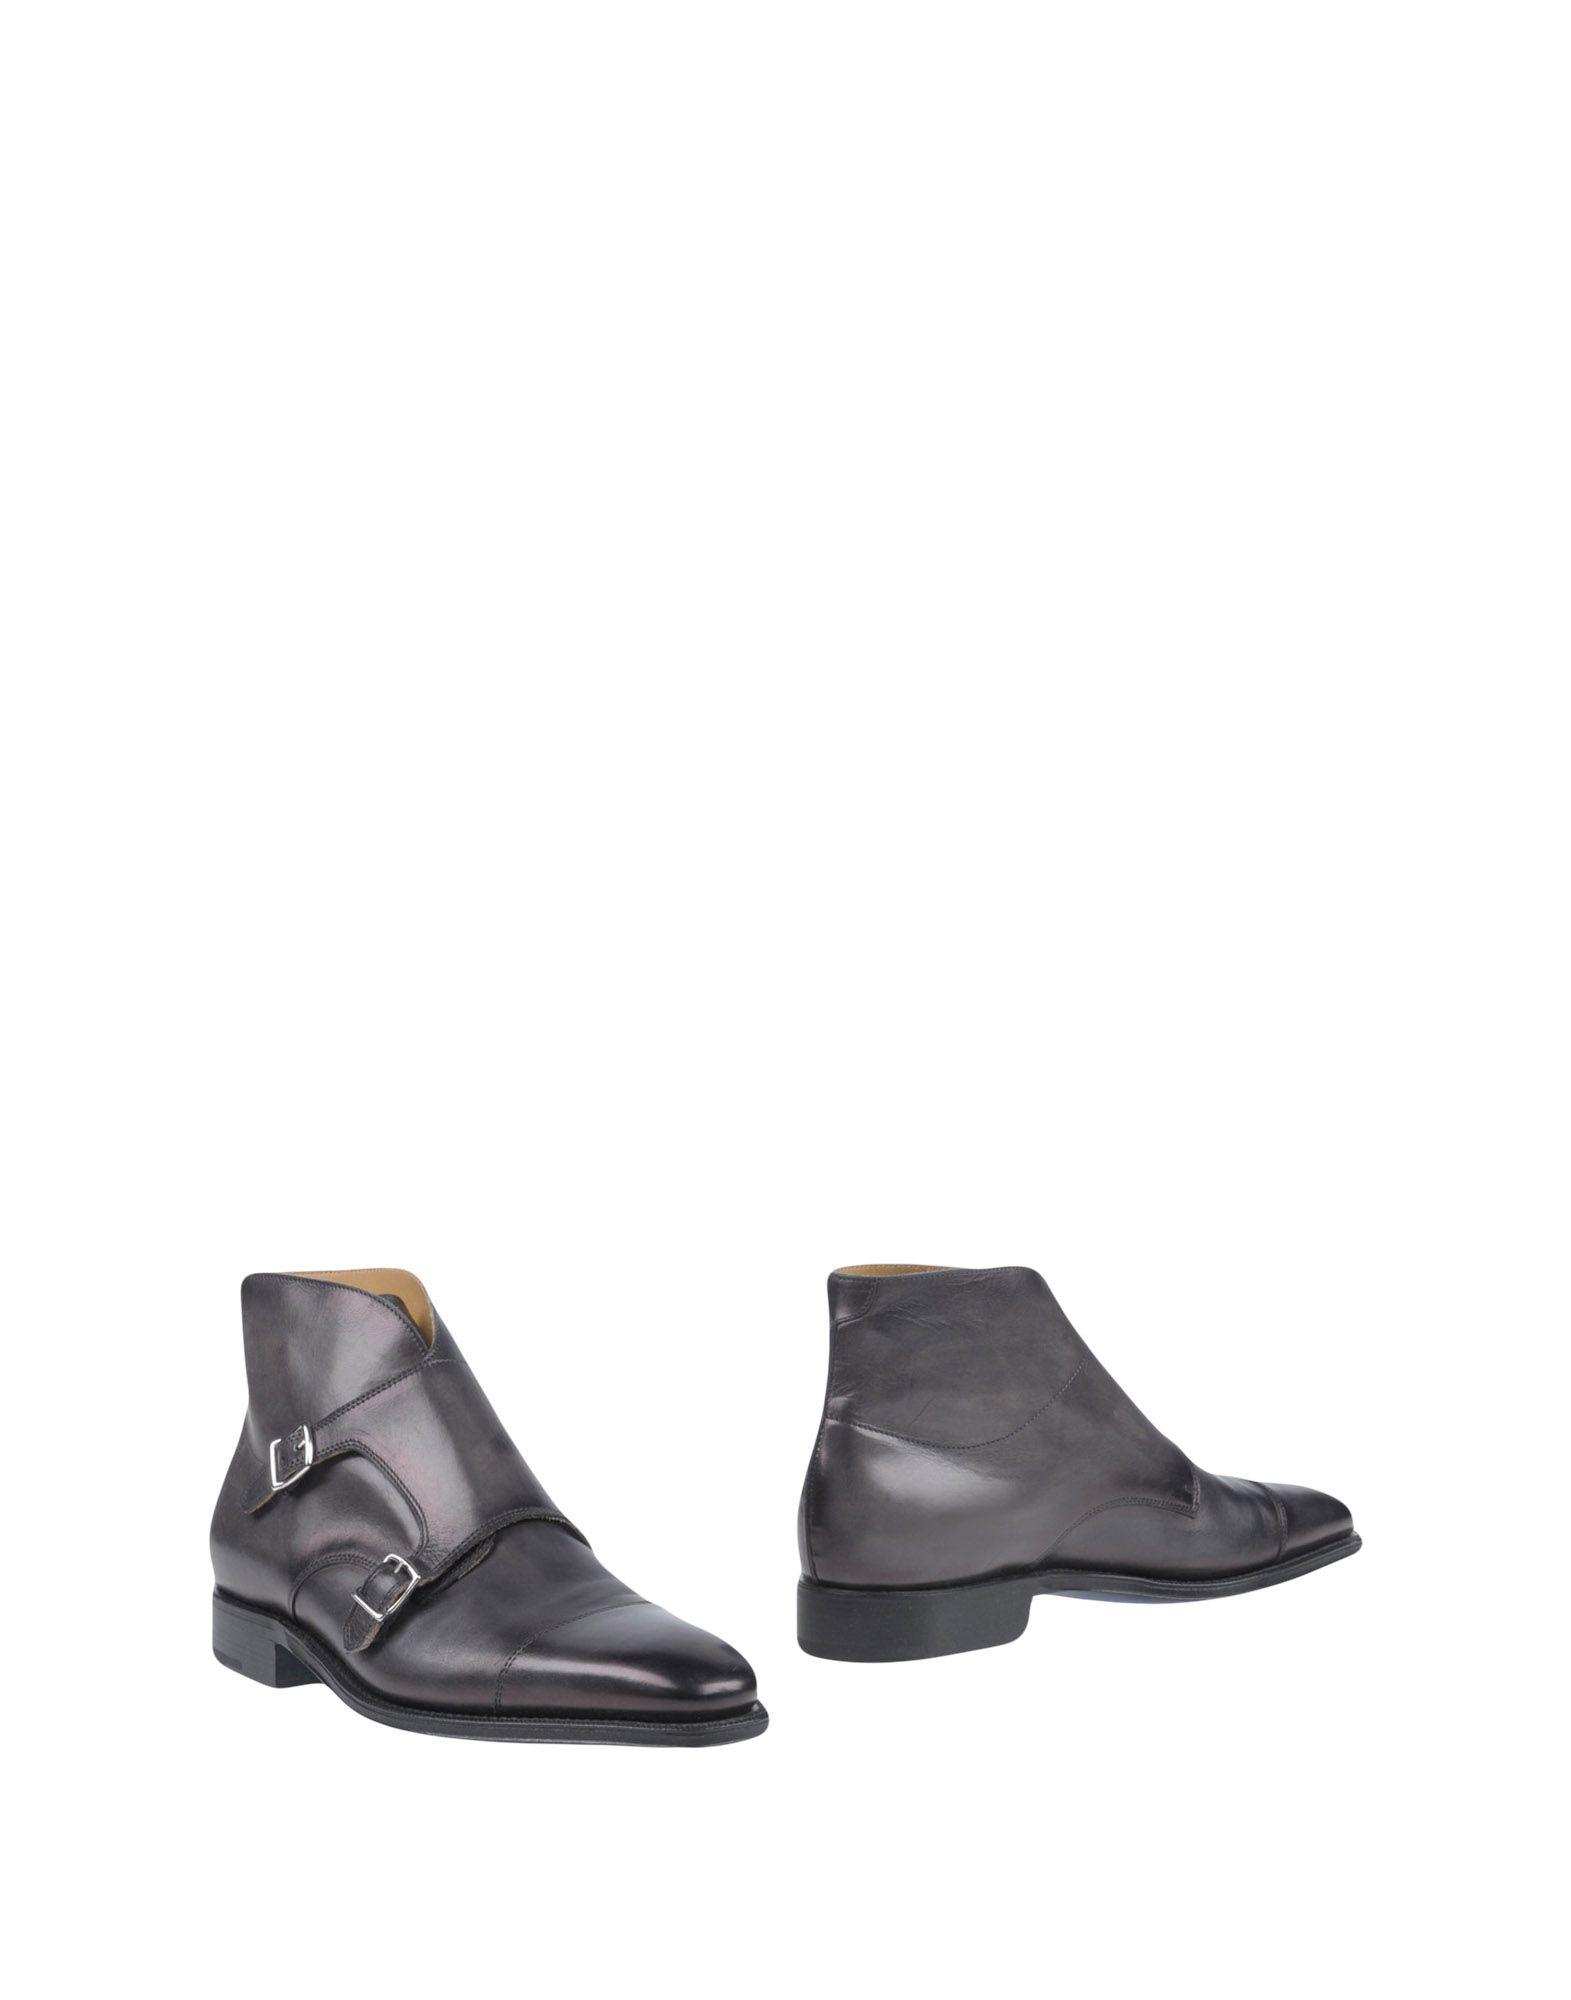 SUTOR MANTELLASSI Полусапоги и высокие ботинки sutor mantellassi полусапоги и высокие ботинки